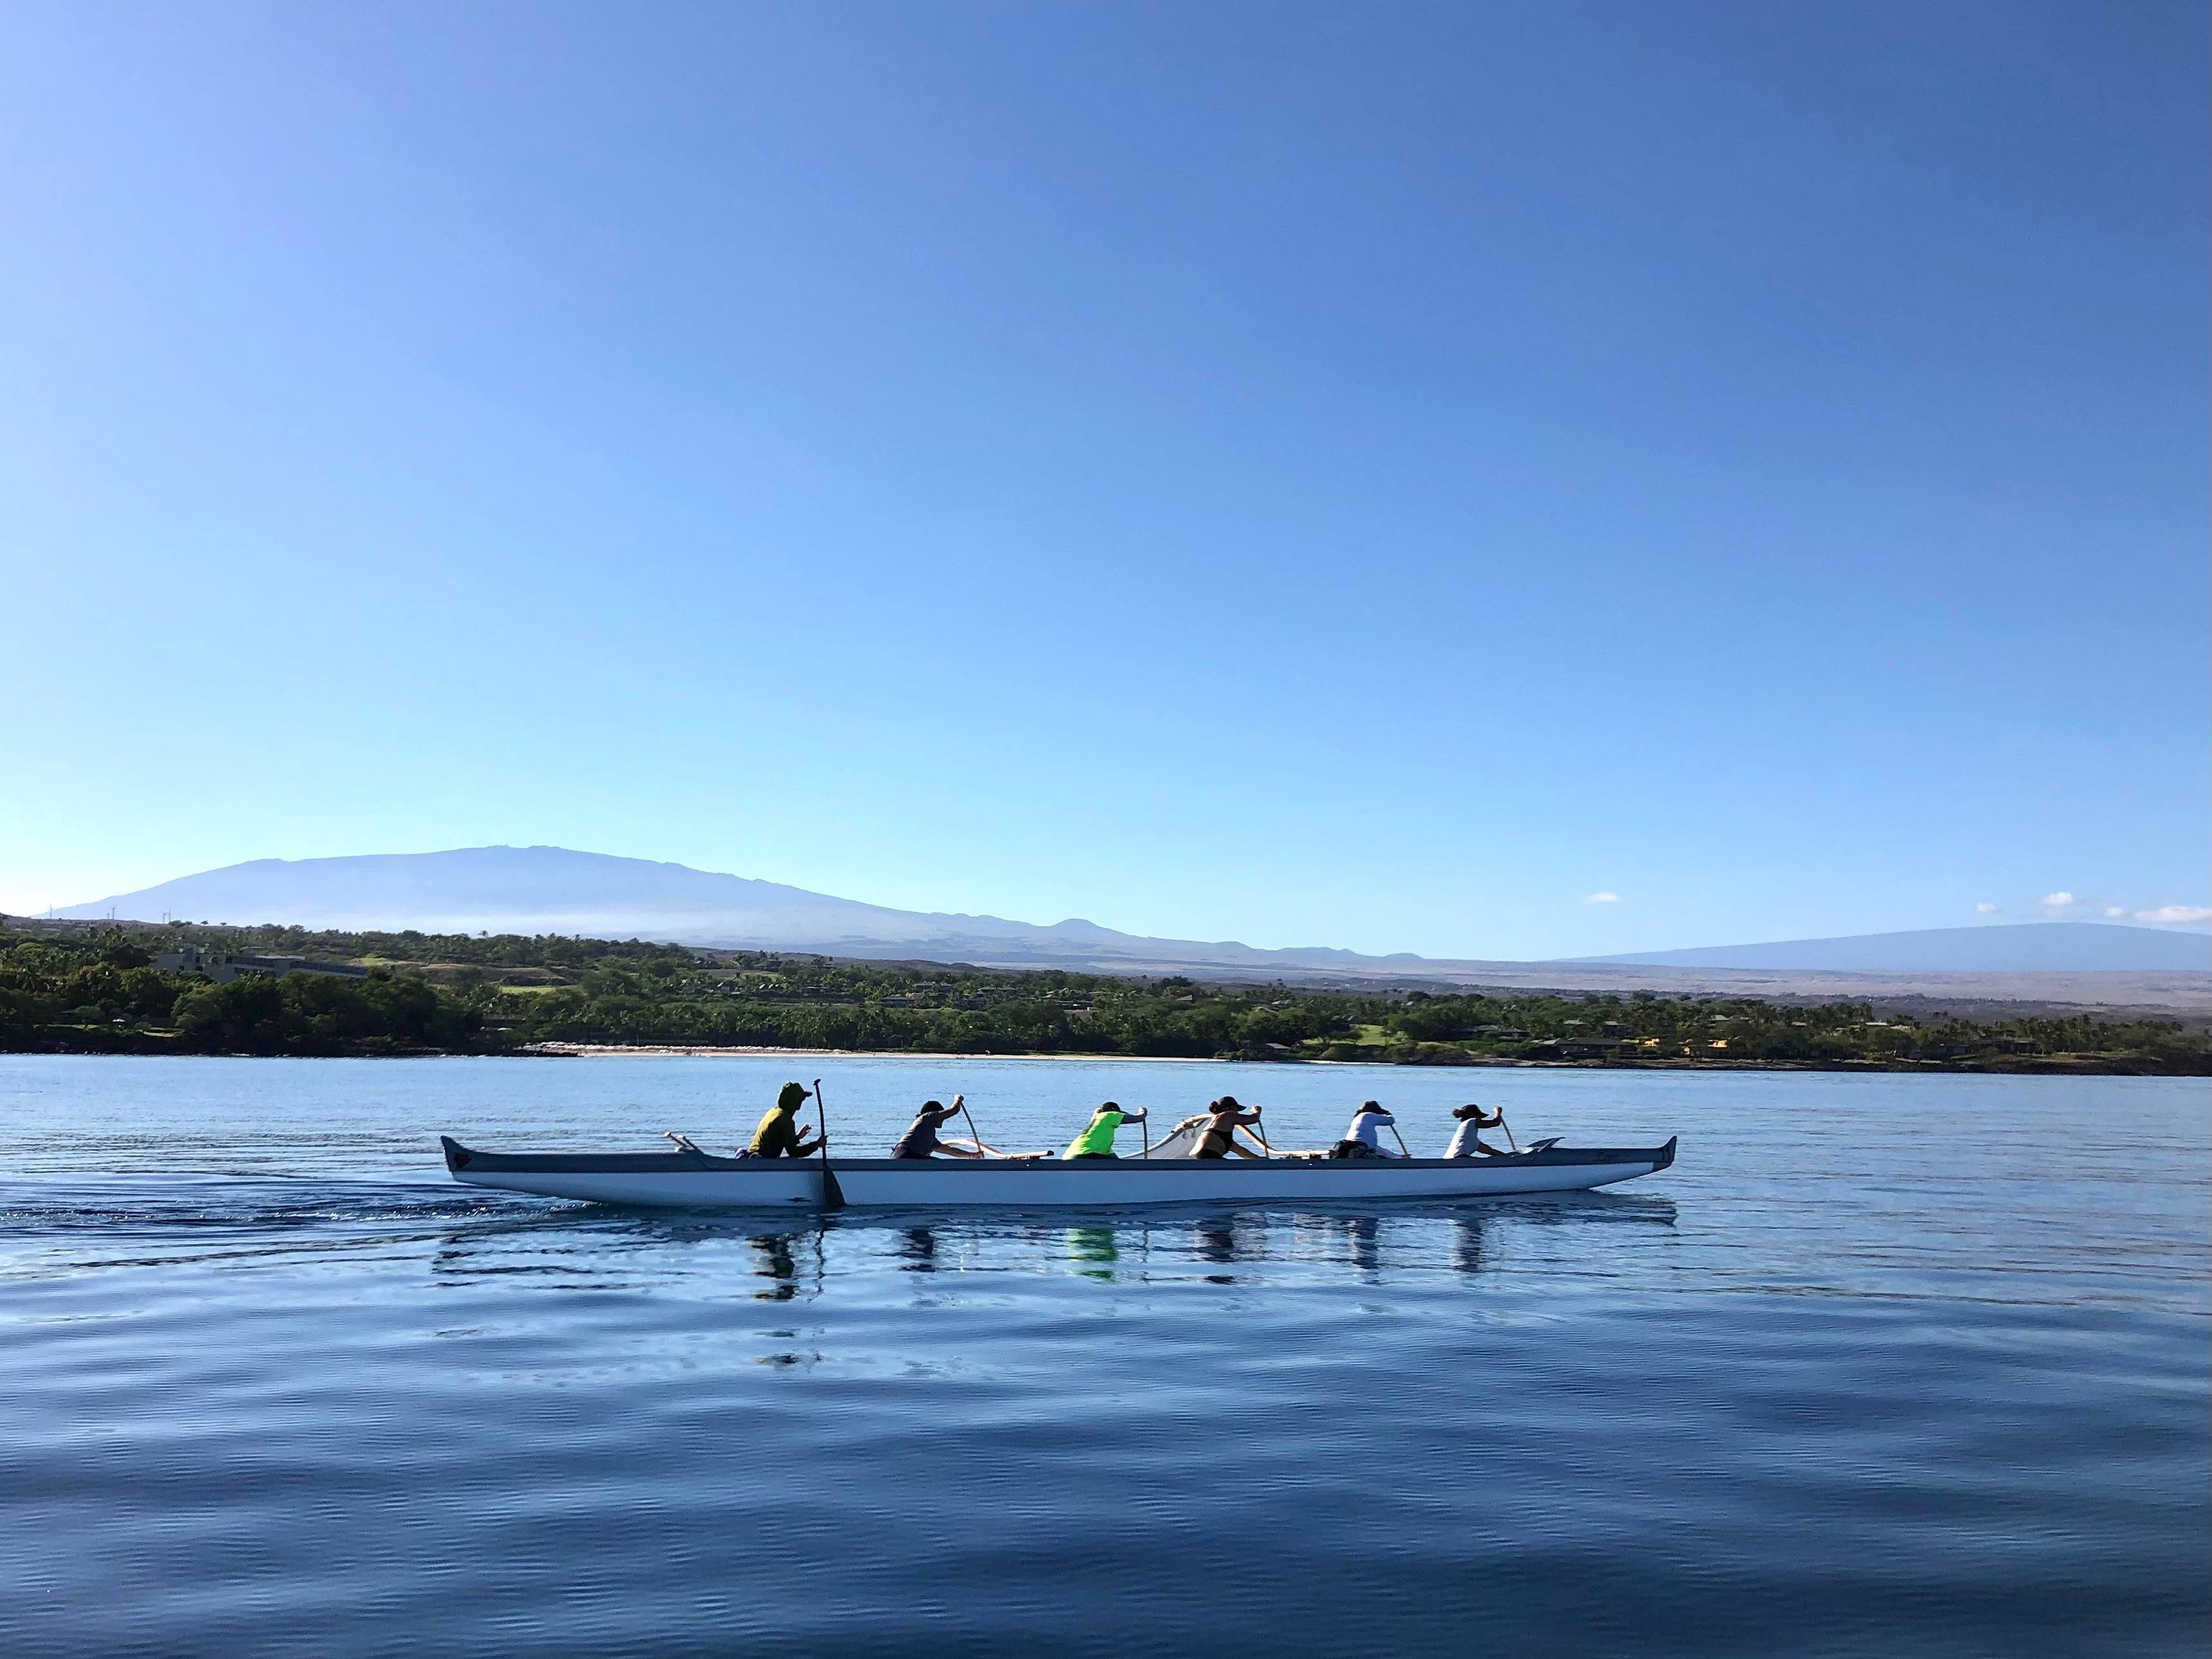 Noelani Spencer Photo_Big Island3_Women in outrigger canooe paddling off the coast of Hawaii Island